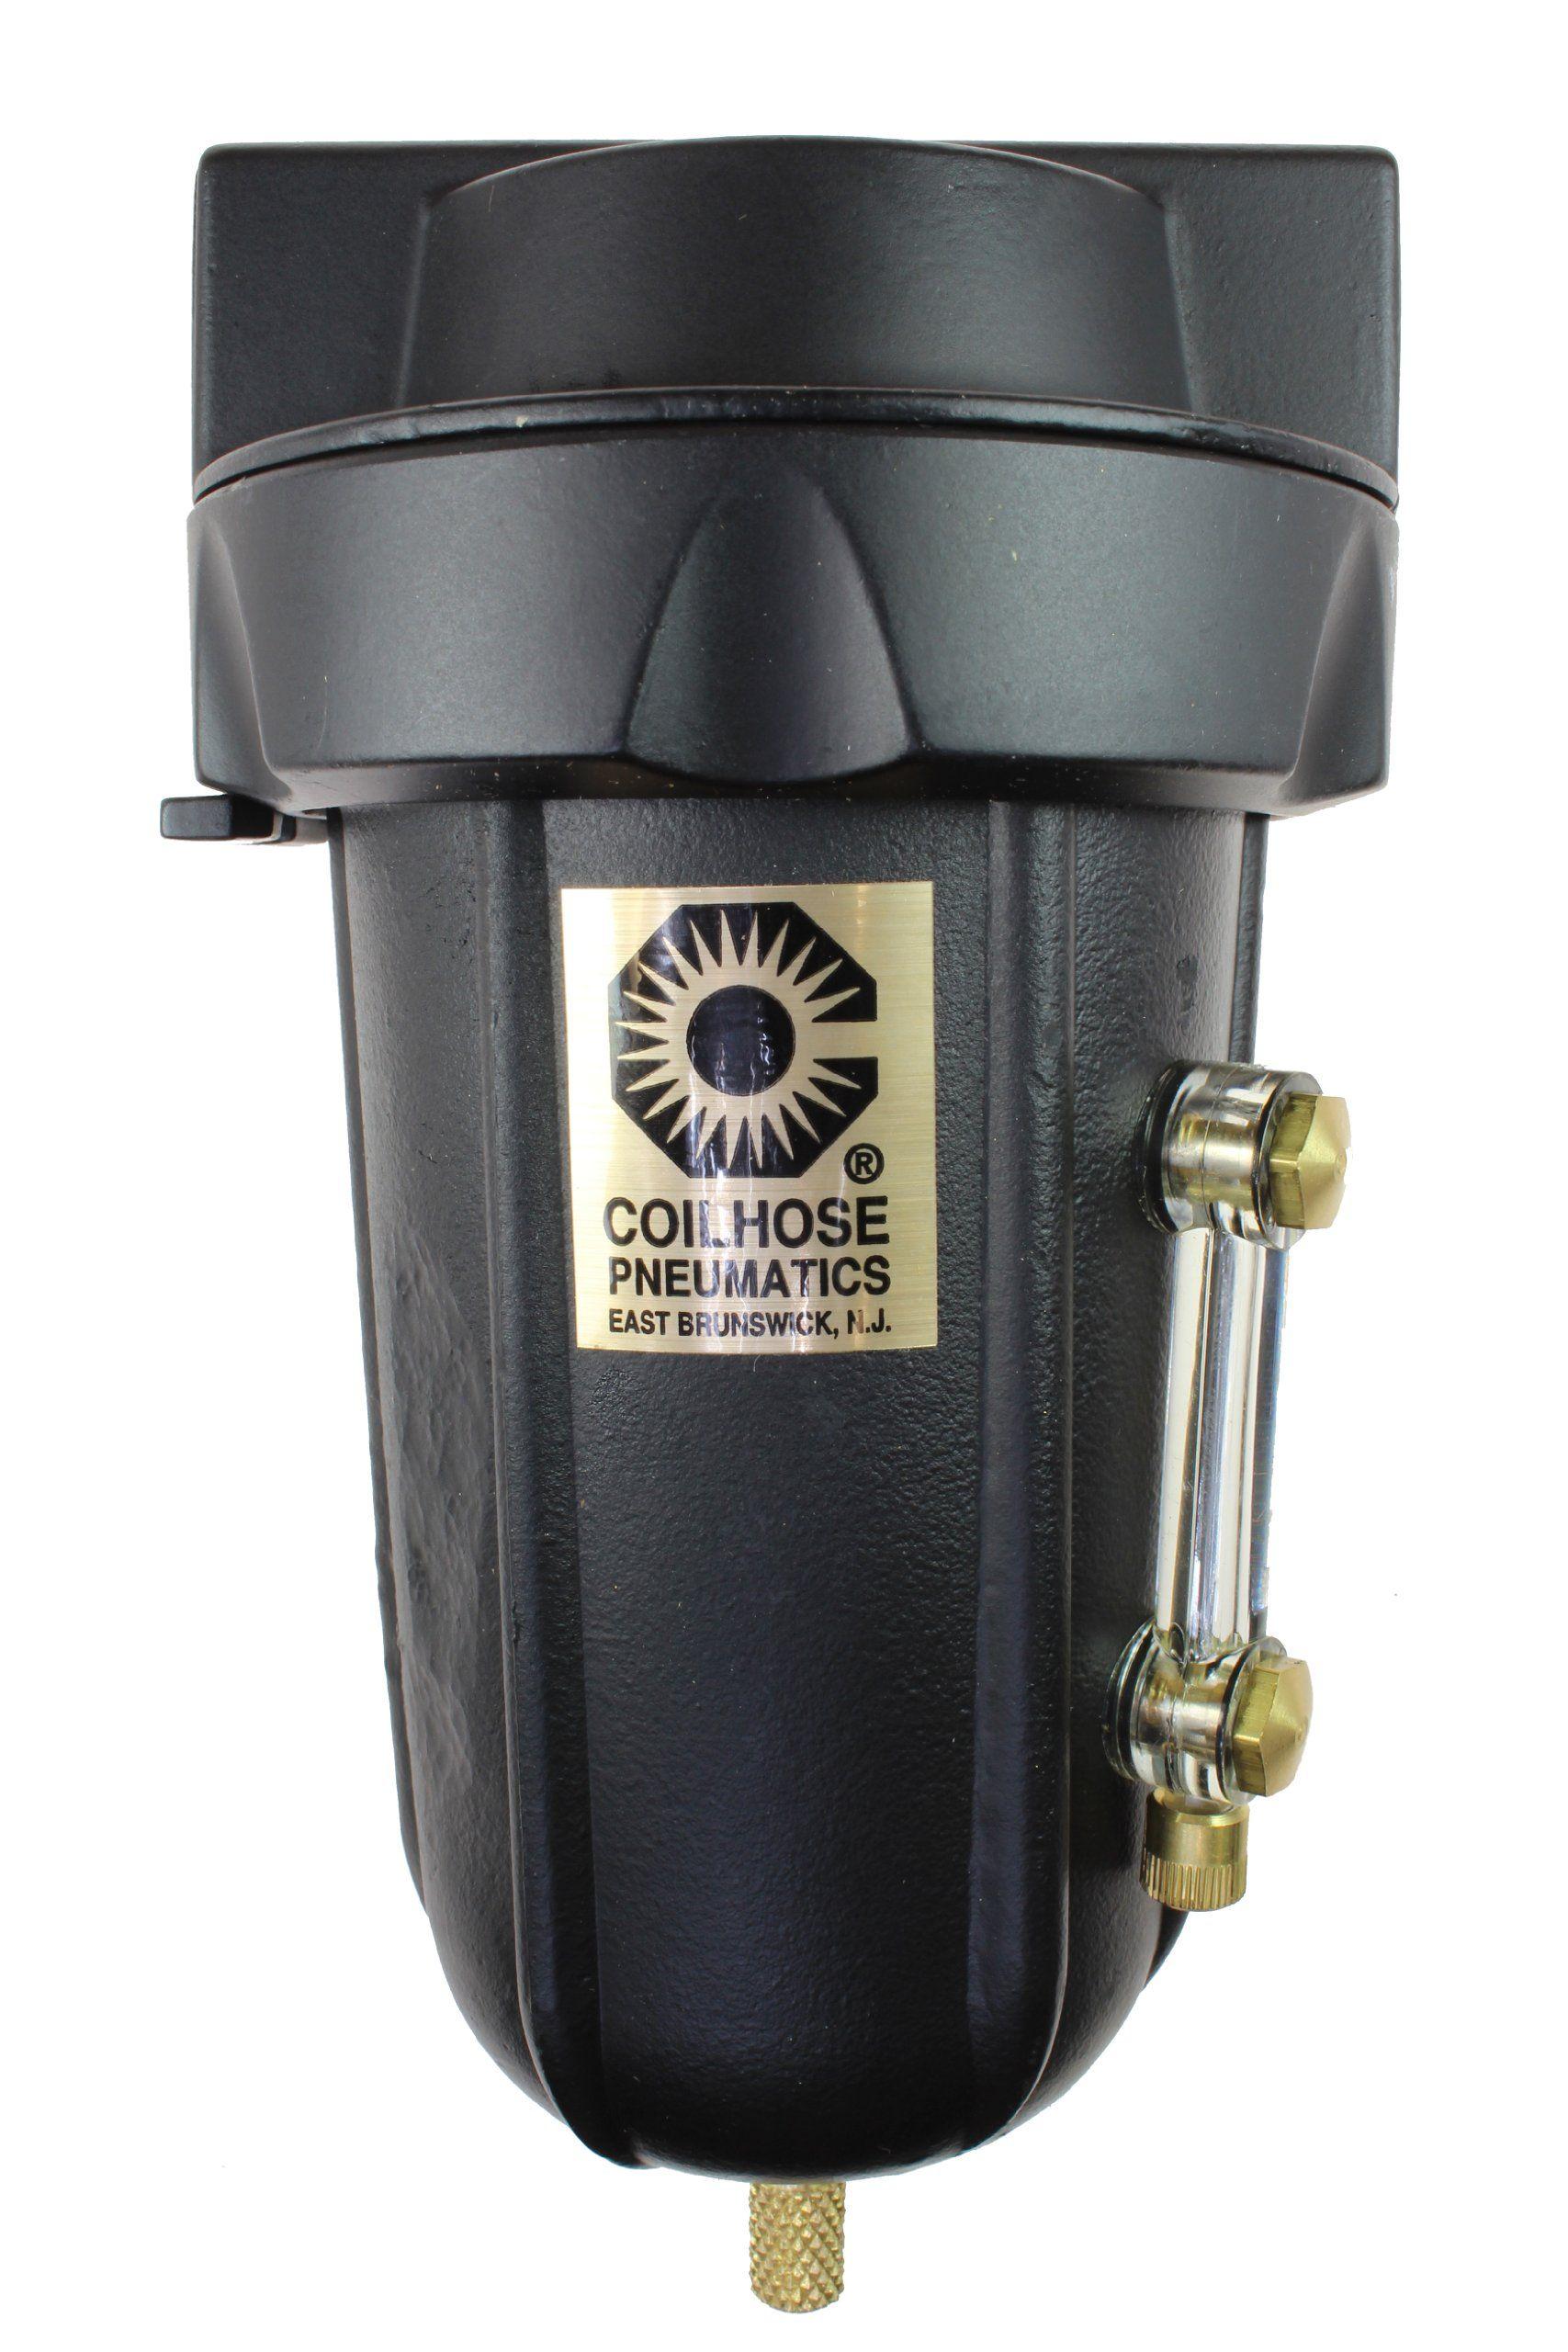 Pin on Water Filter